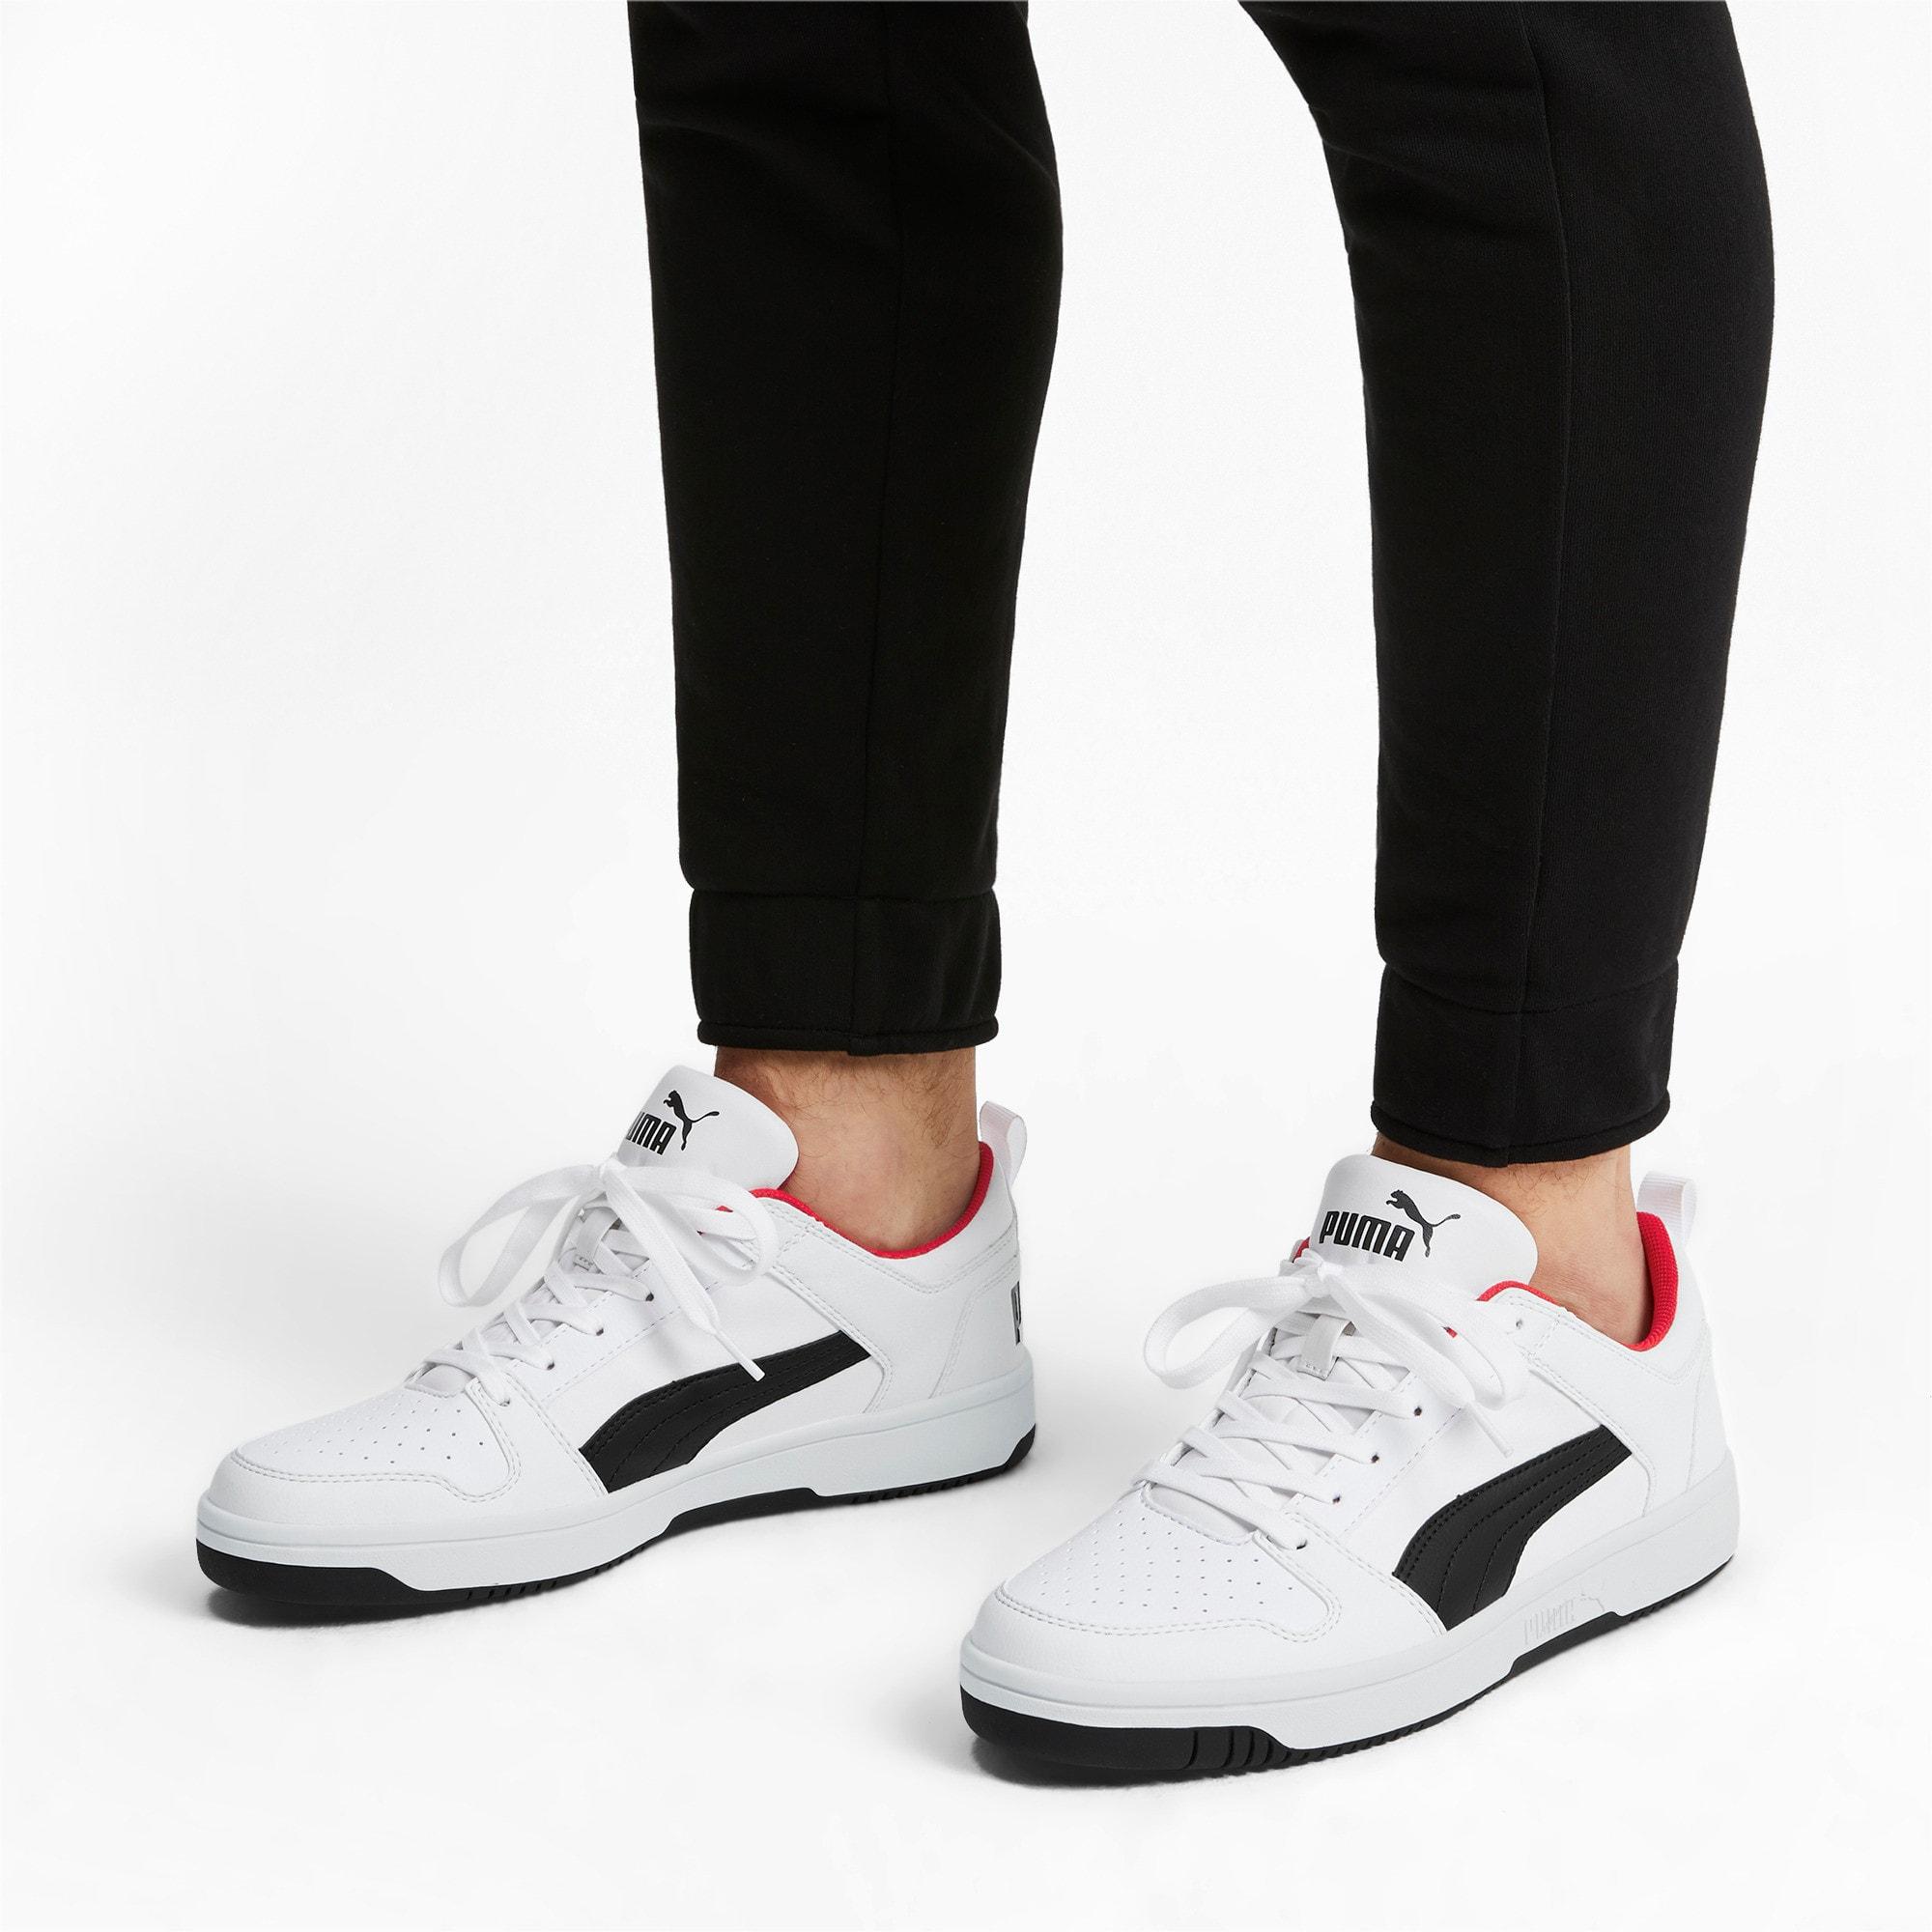 Miniatura 2 de Zapatos deportivos PUMA Rebound LayUp Lo, White-Black-High Risk Red, mediano